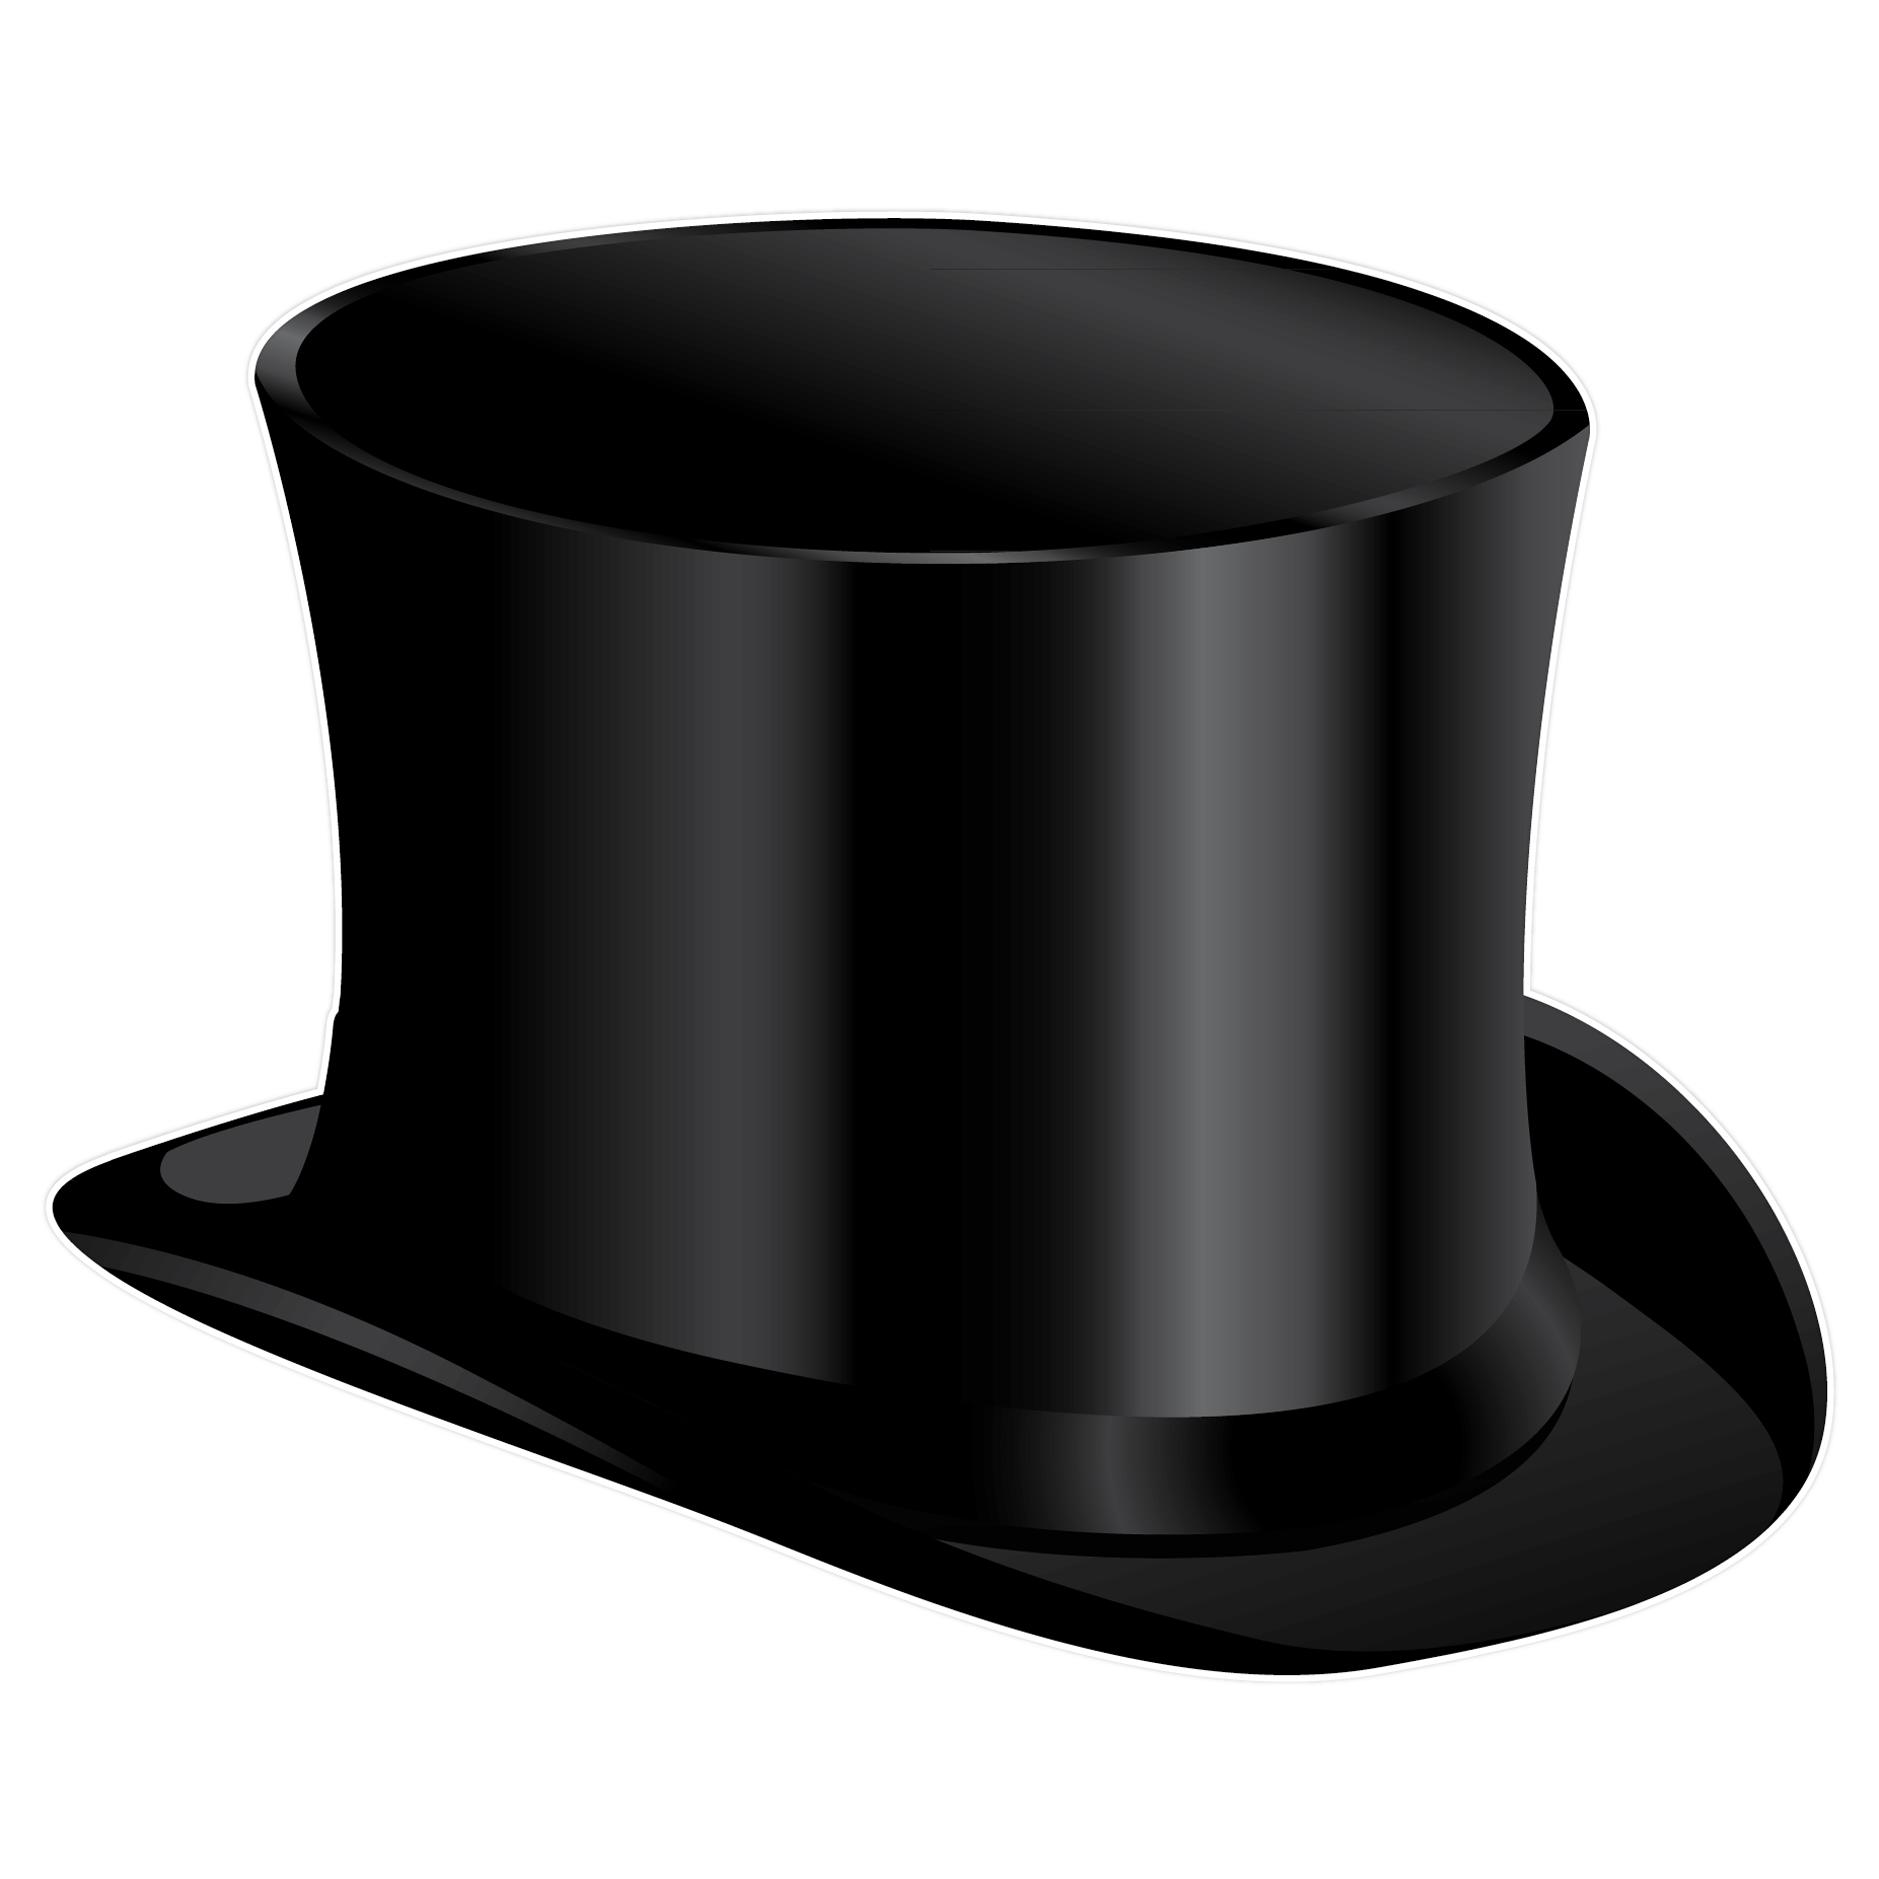 1879x1879 Best Top Hat Outline